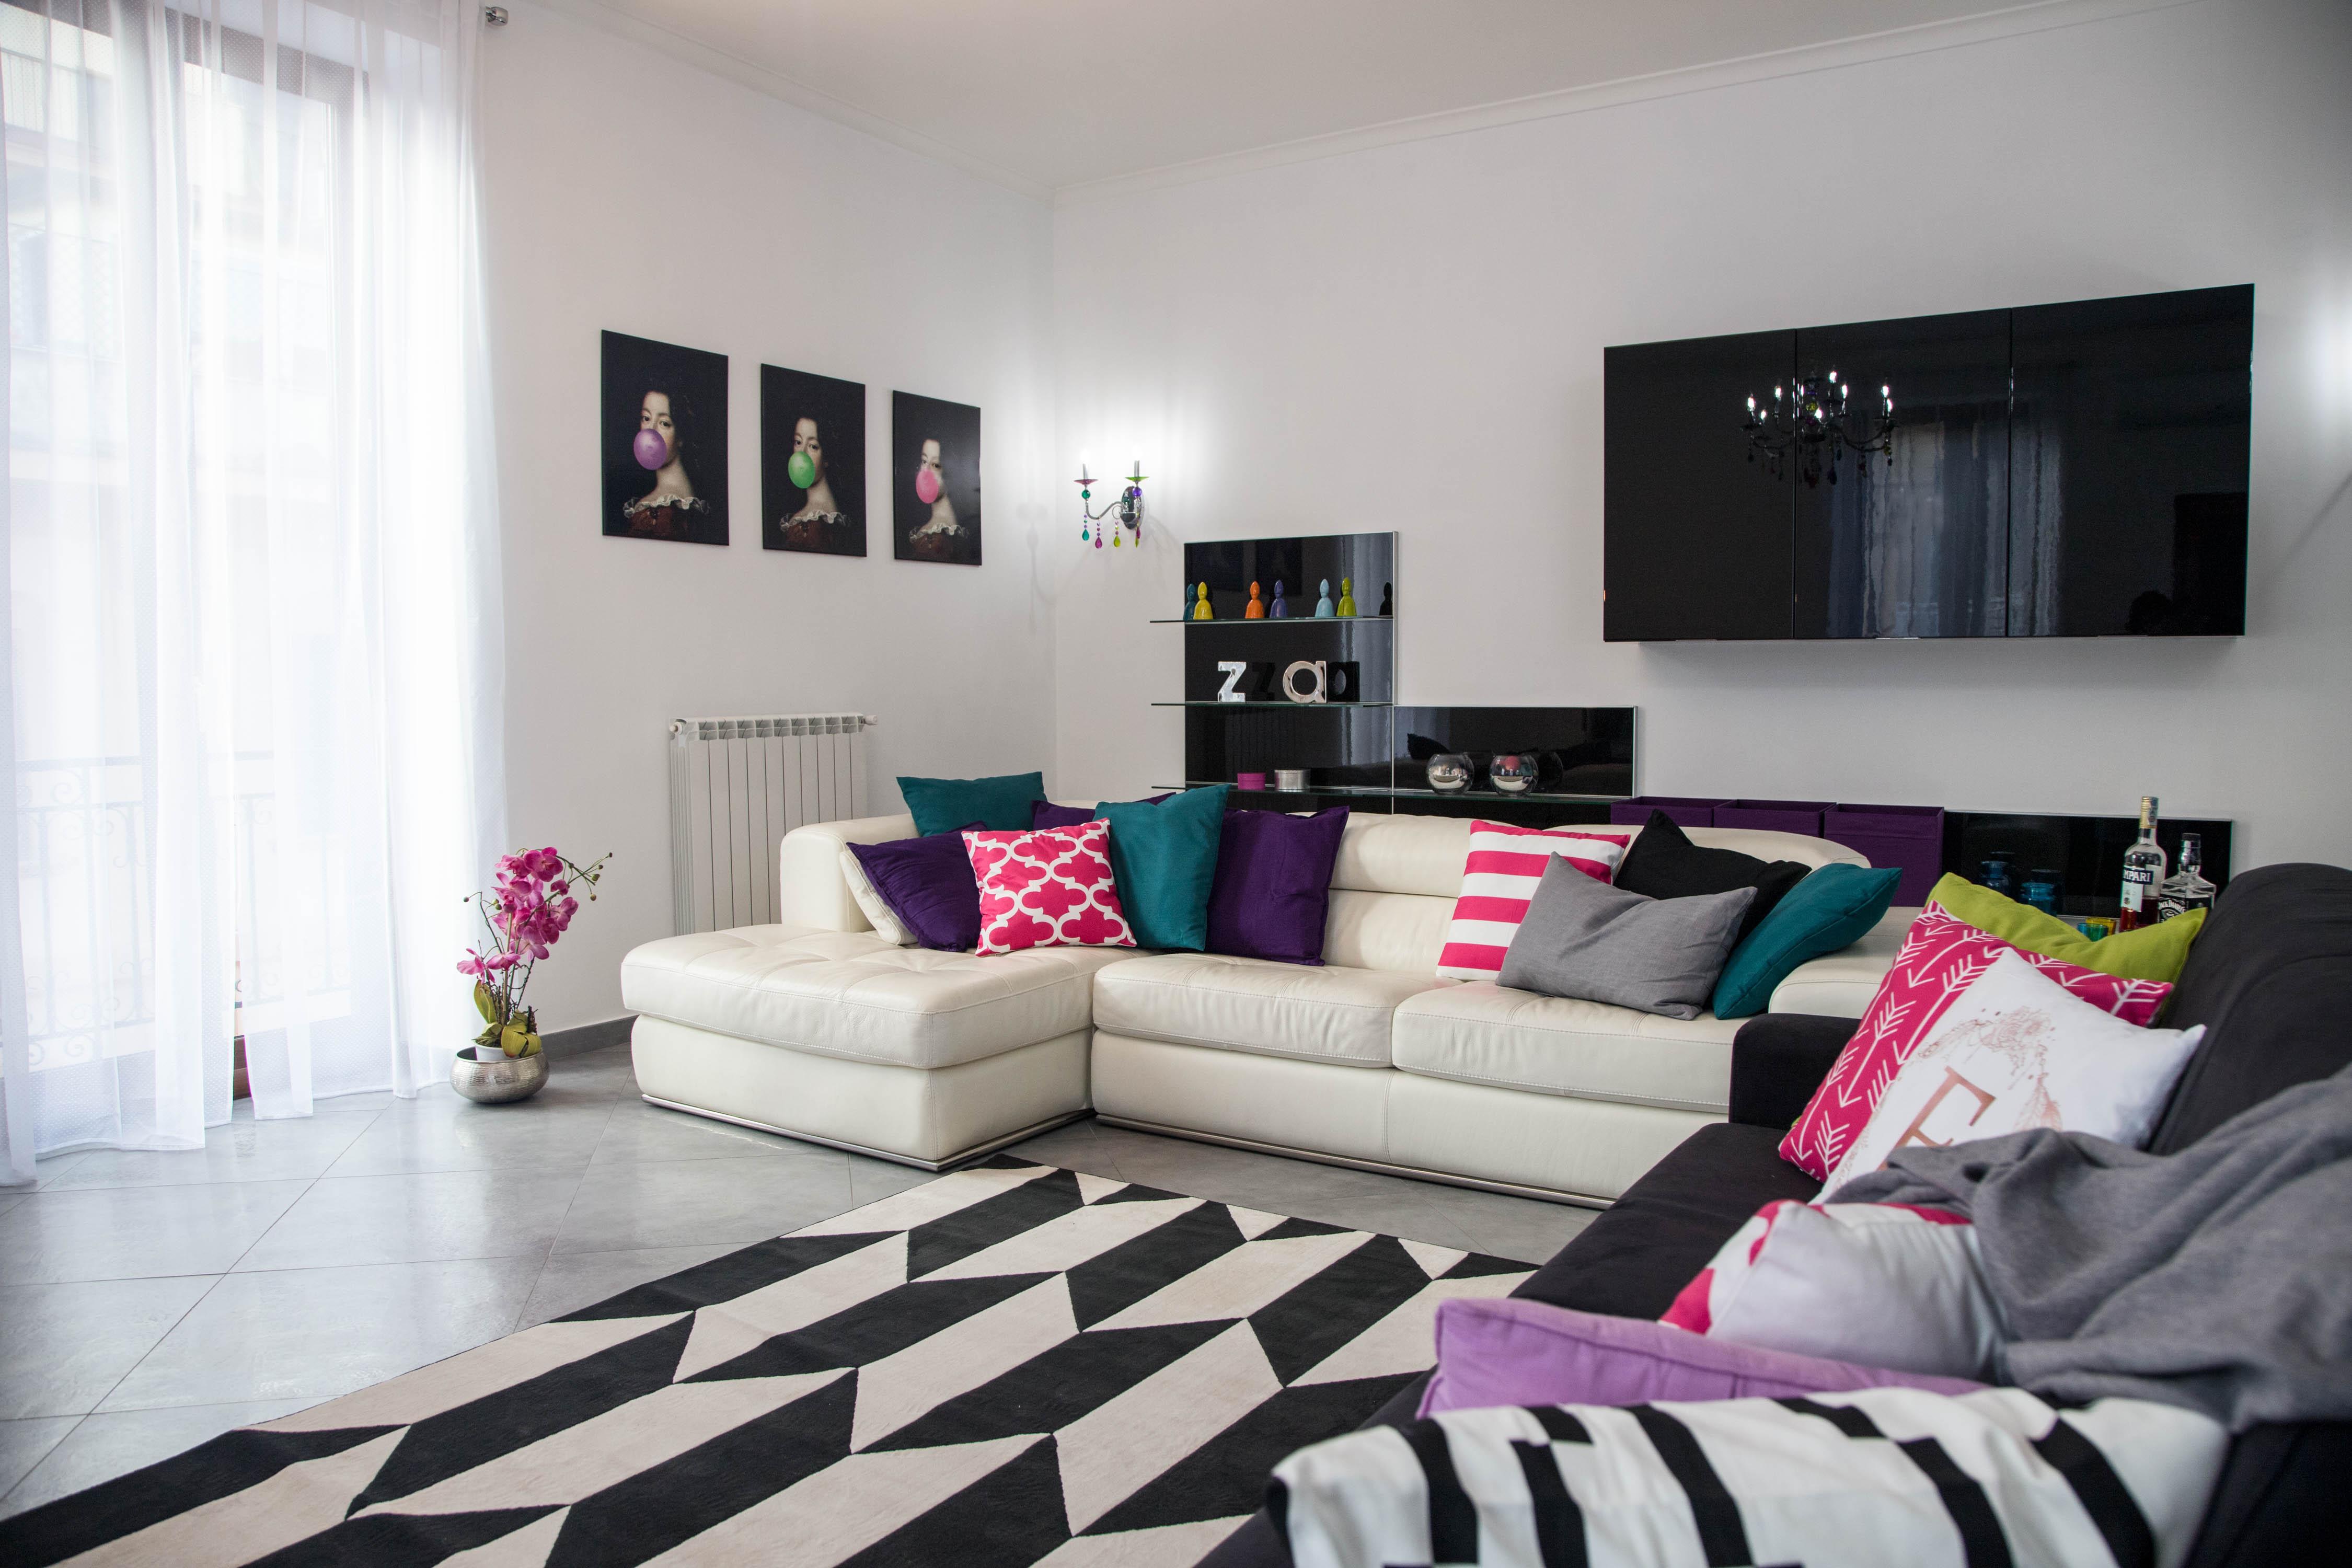 Ferdinando Arthouse - Oversized Modern Apartment photo 20131151